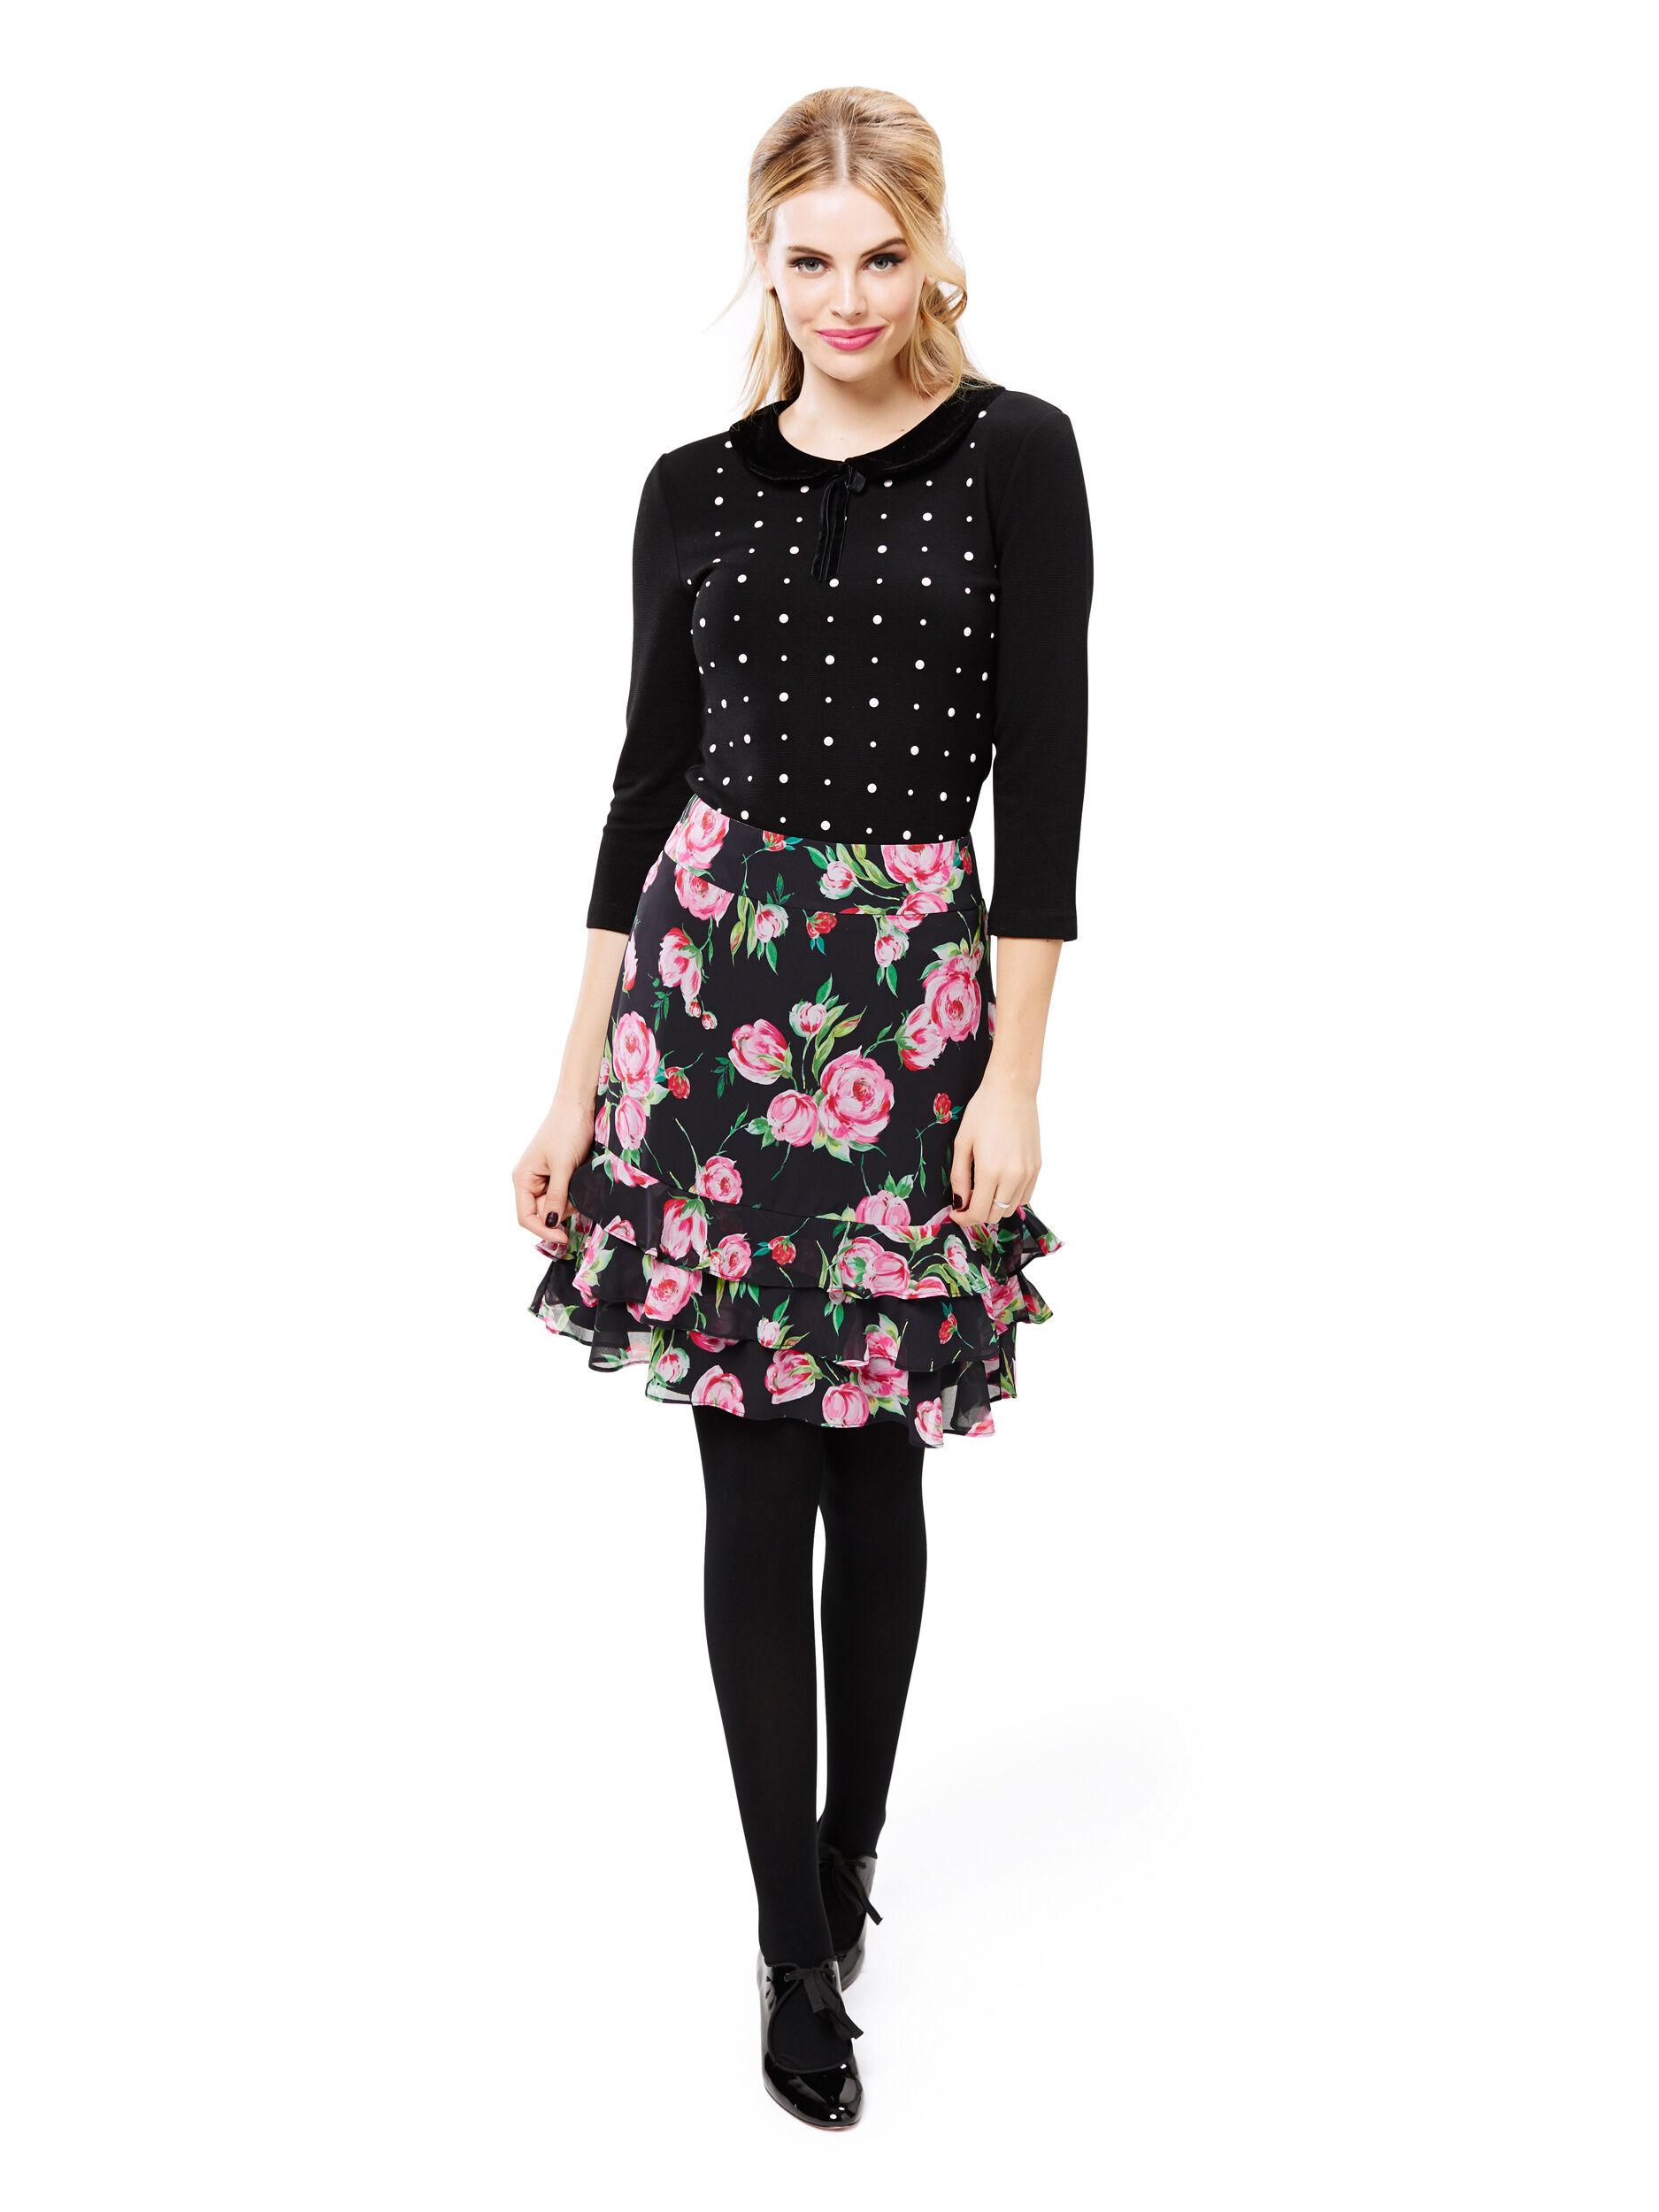 Lyla Rose Skirt